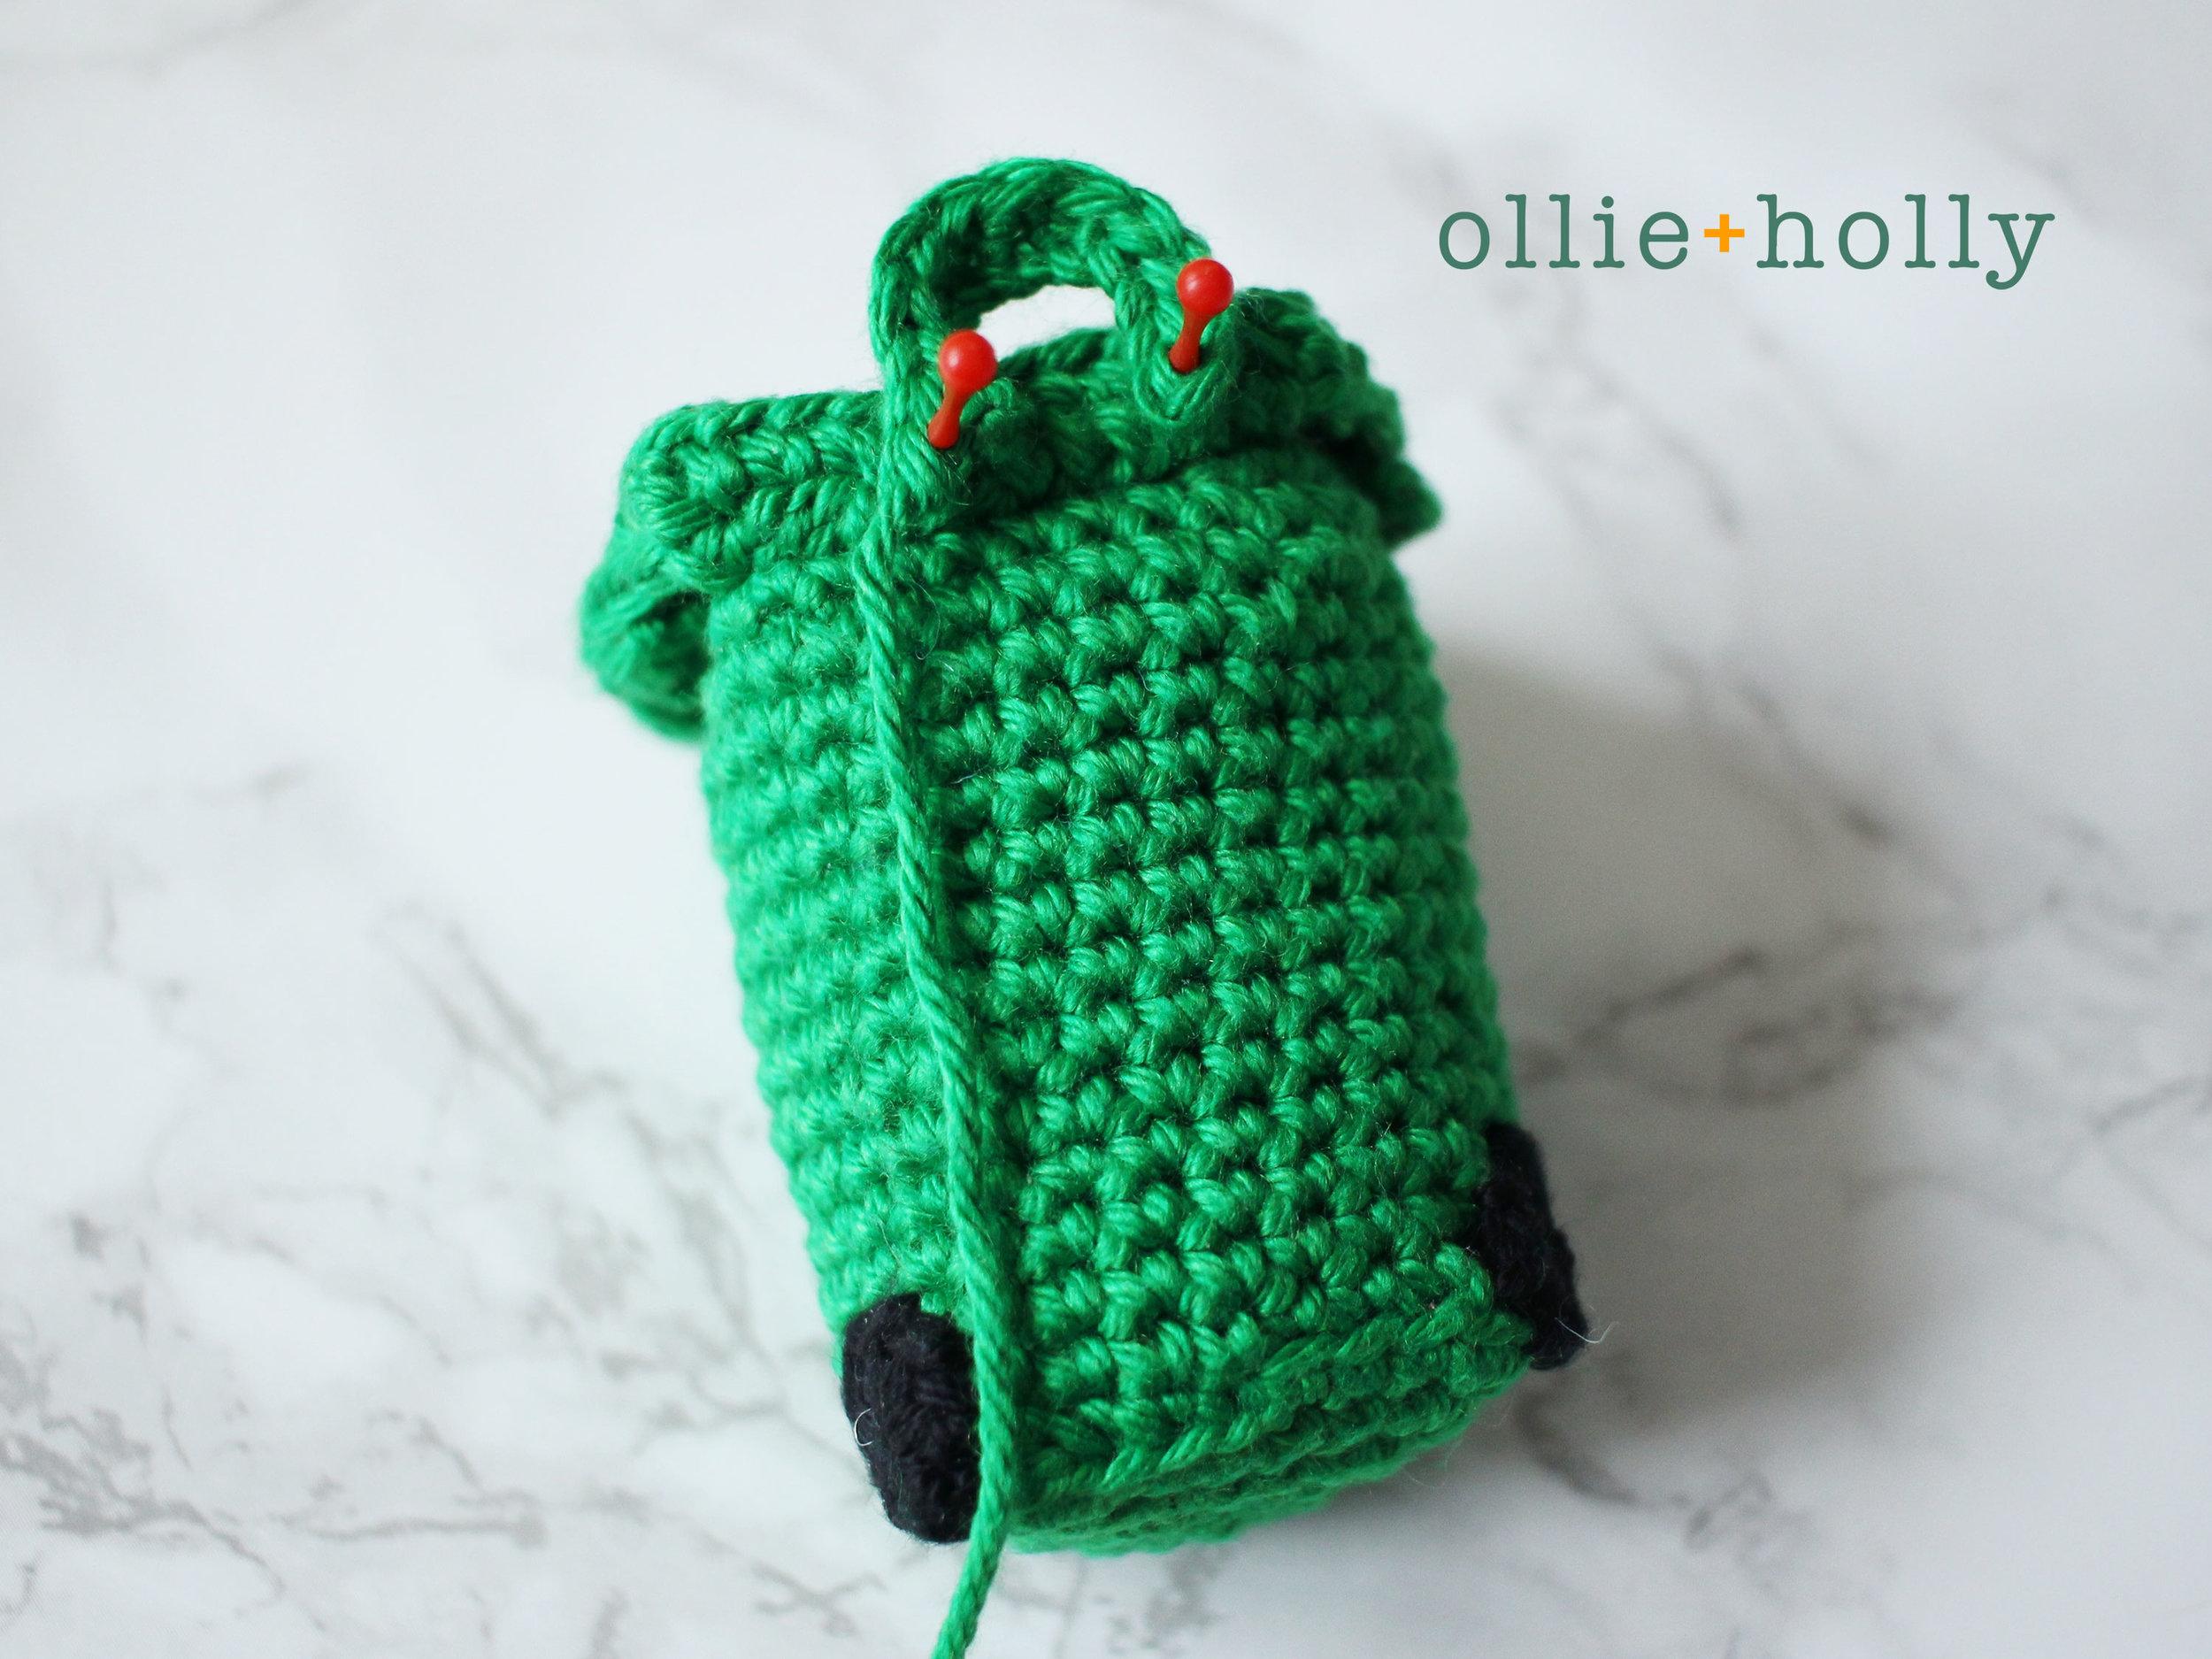 Free Toronto Green Bin Amigurumi Crochet Pattern Step 8